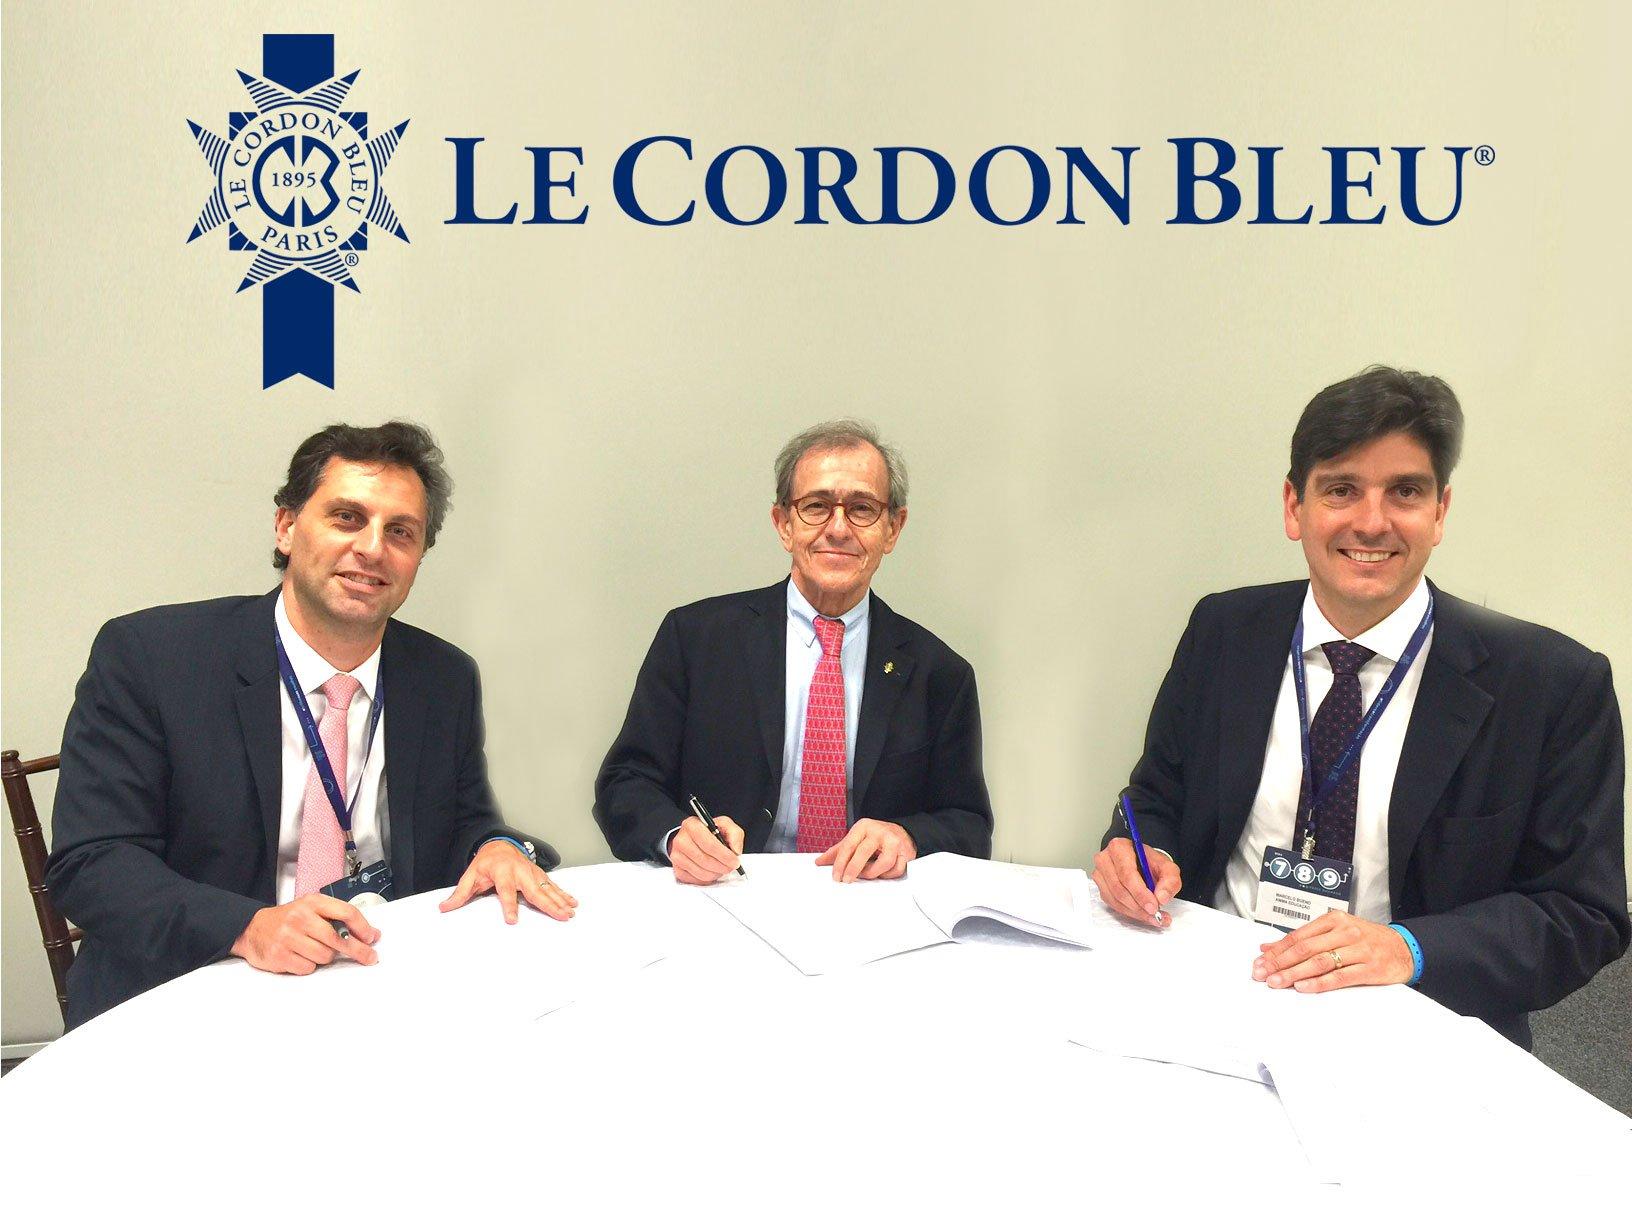 Photo (de droite à gauche) – Daniel Faccini Castanho (Anima), André Cointreau (Le Cordon Bleu), Vice-Président Marcelo Battistella Bueno (Anima)